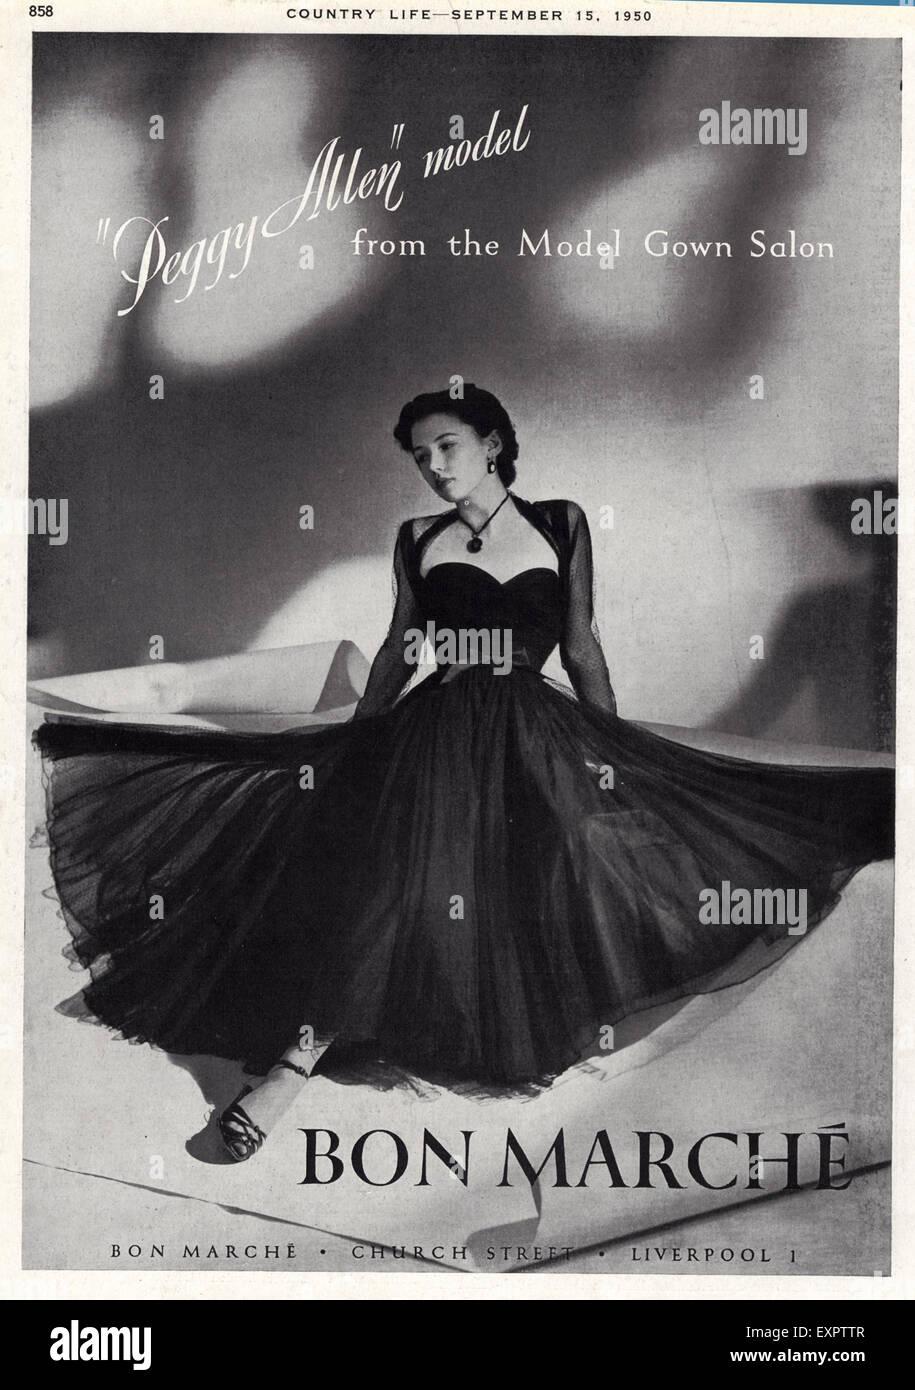 1950s UK Bon Marche Magazine Advert - Stock Image